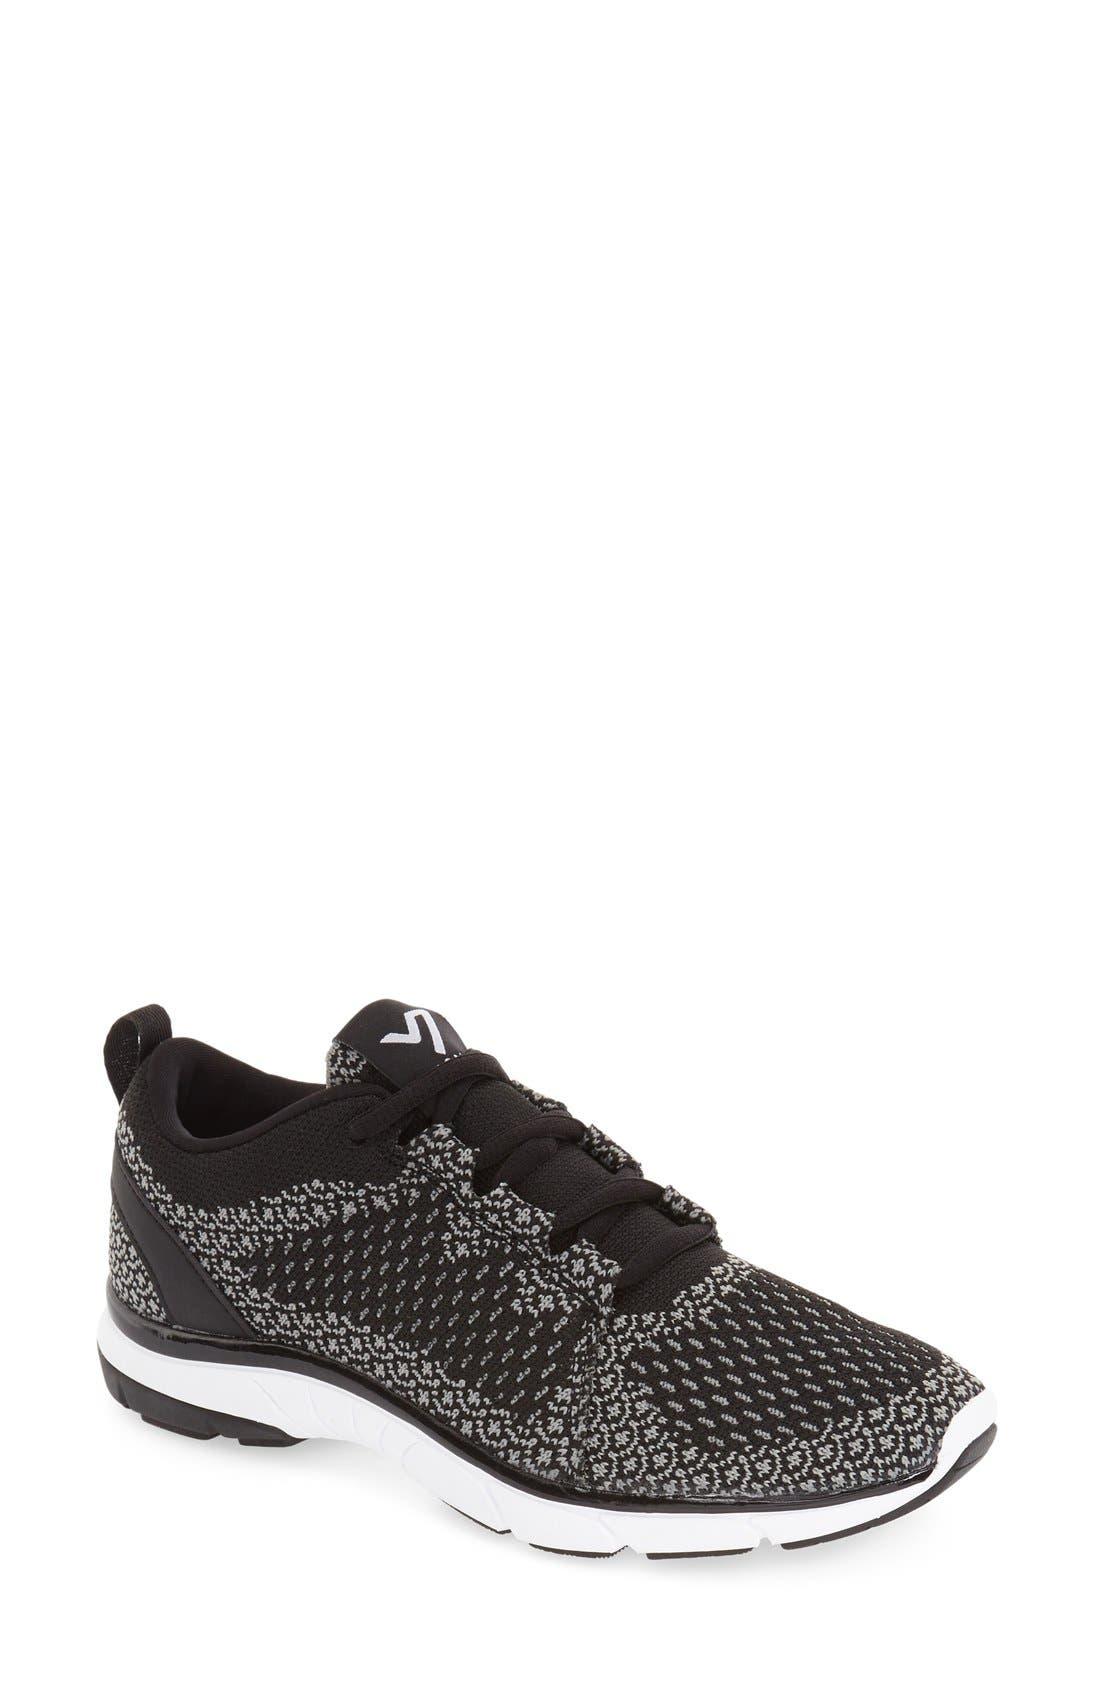 'Sierra' Sneaker,                         Main,                         color, Black/ Charcoal